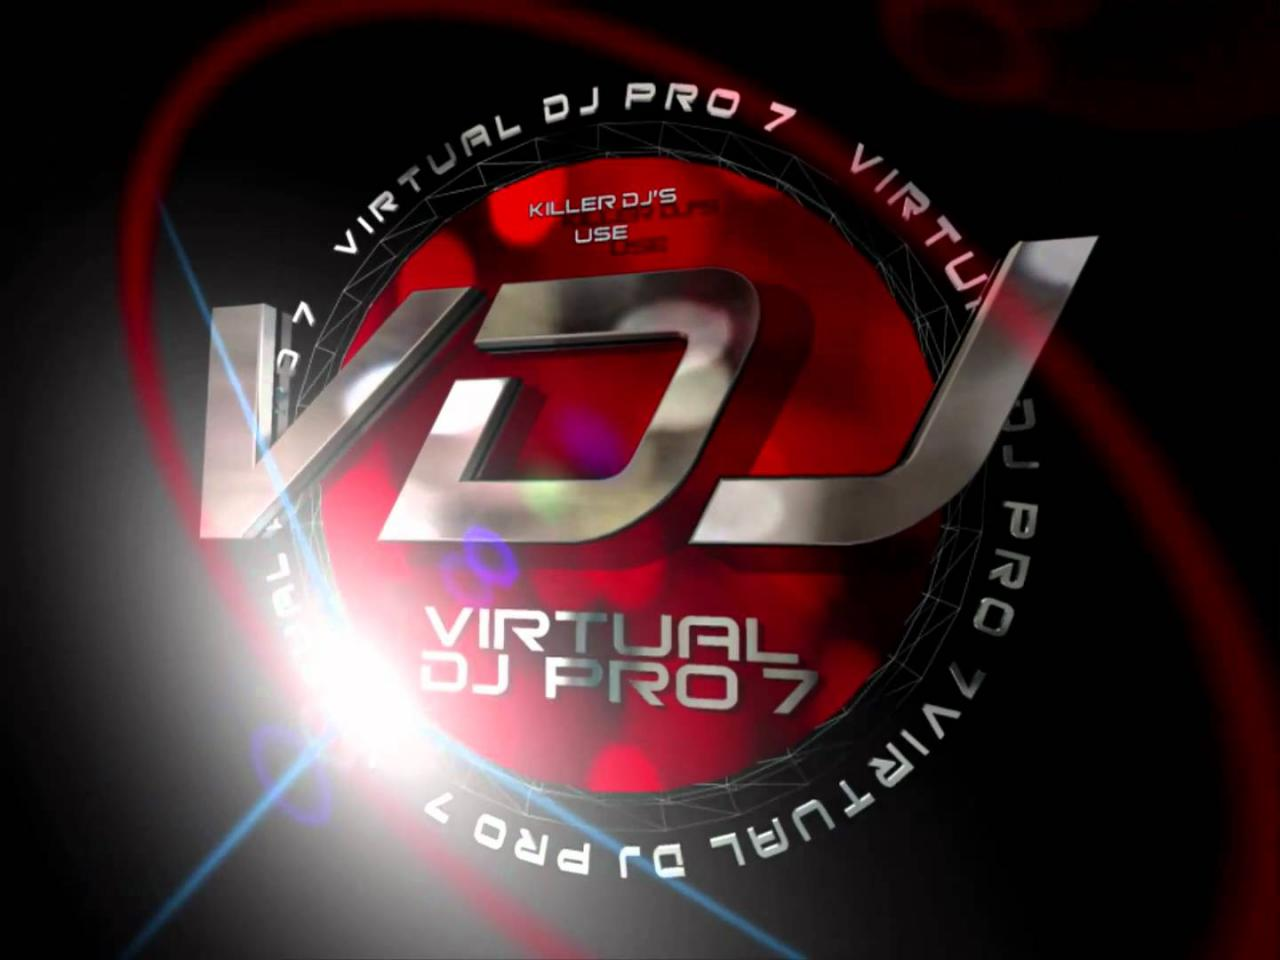 Vitrtual DJ 00